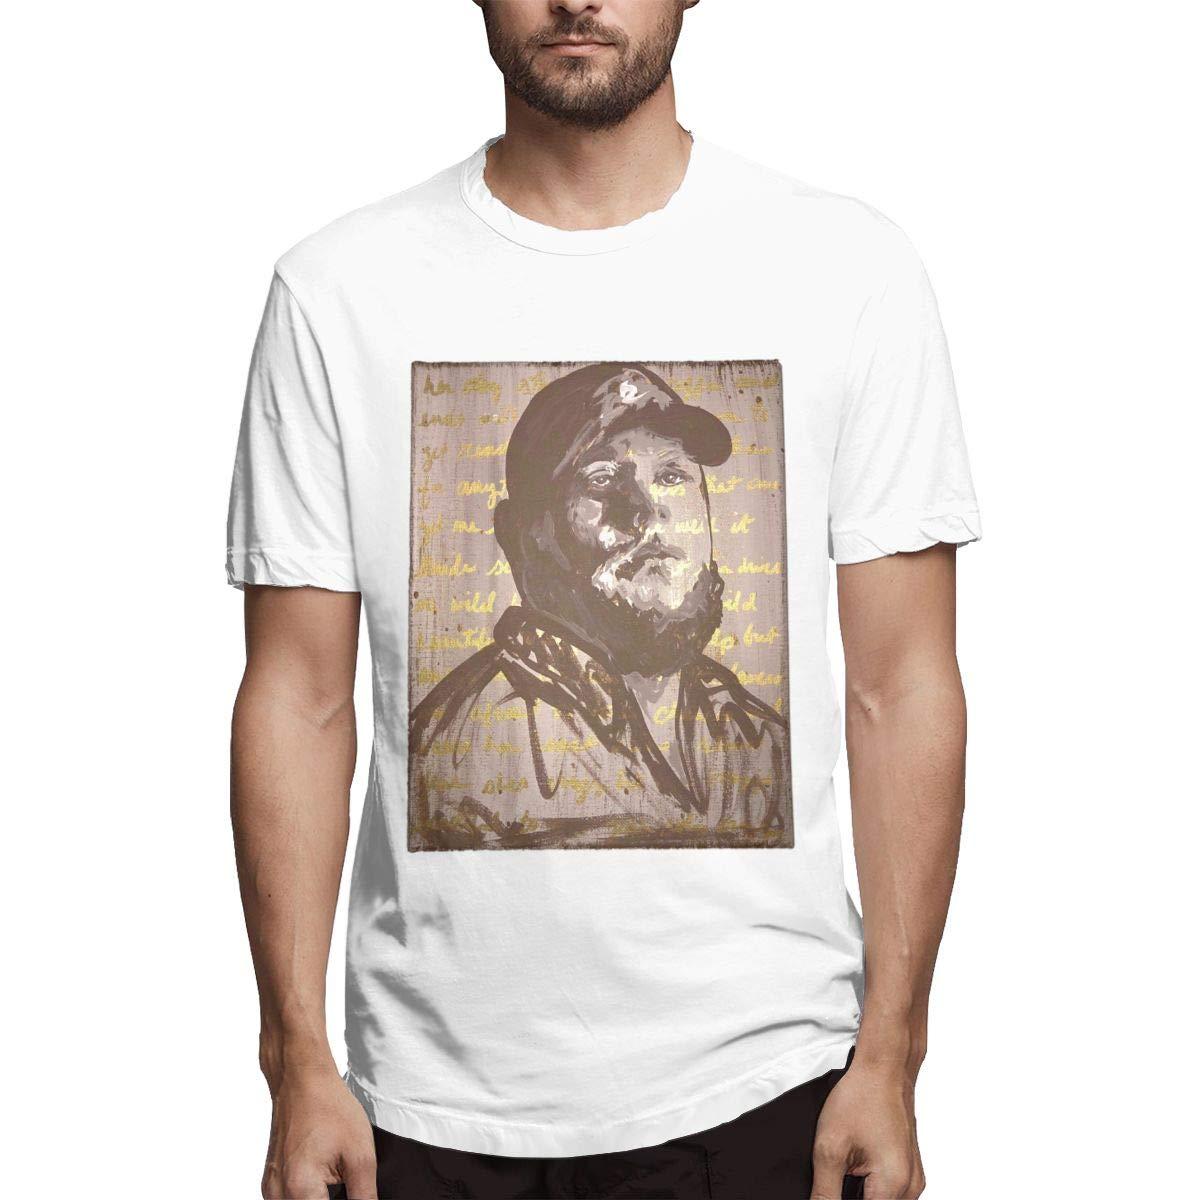 Hanghisi Luke Combs S Pop Short Sleeves T Shirt Classic T Shirt